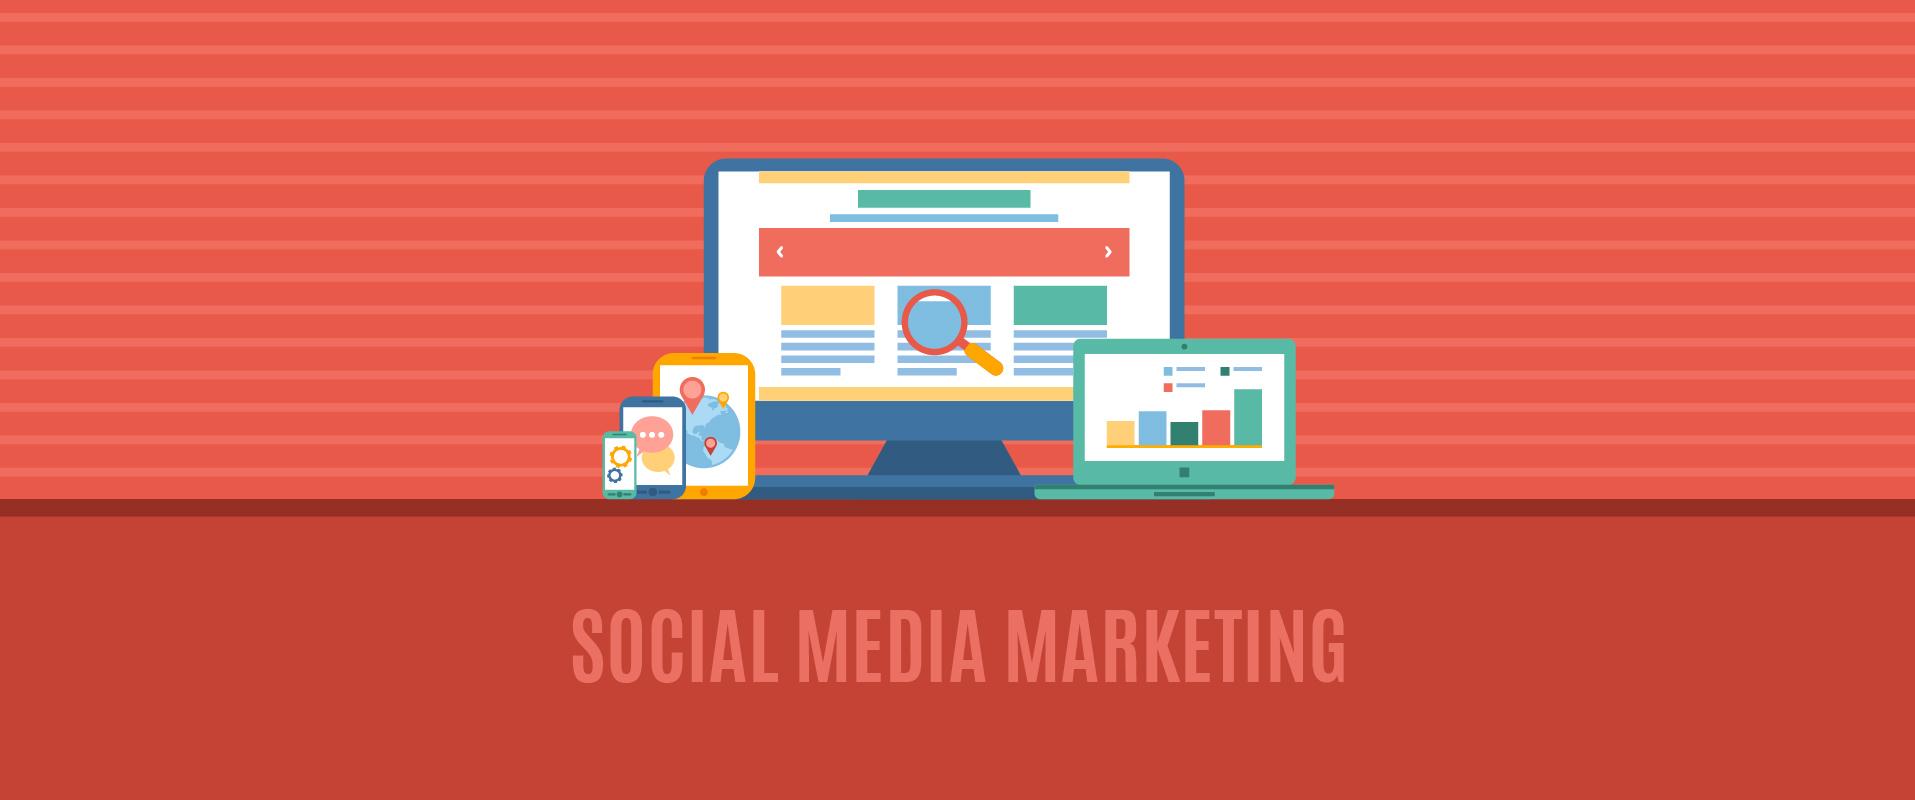 Social Media Marketing: alcuni tool per semplificarvi la vita!